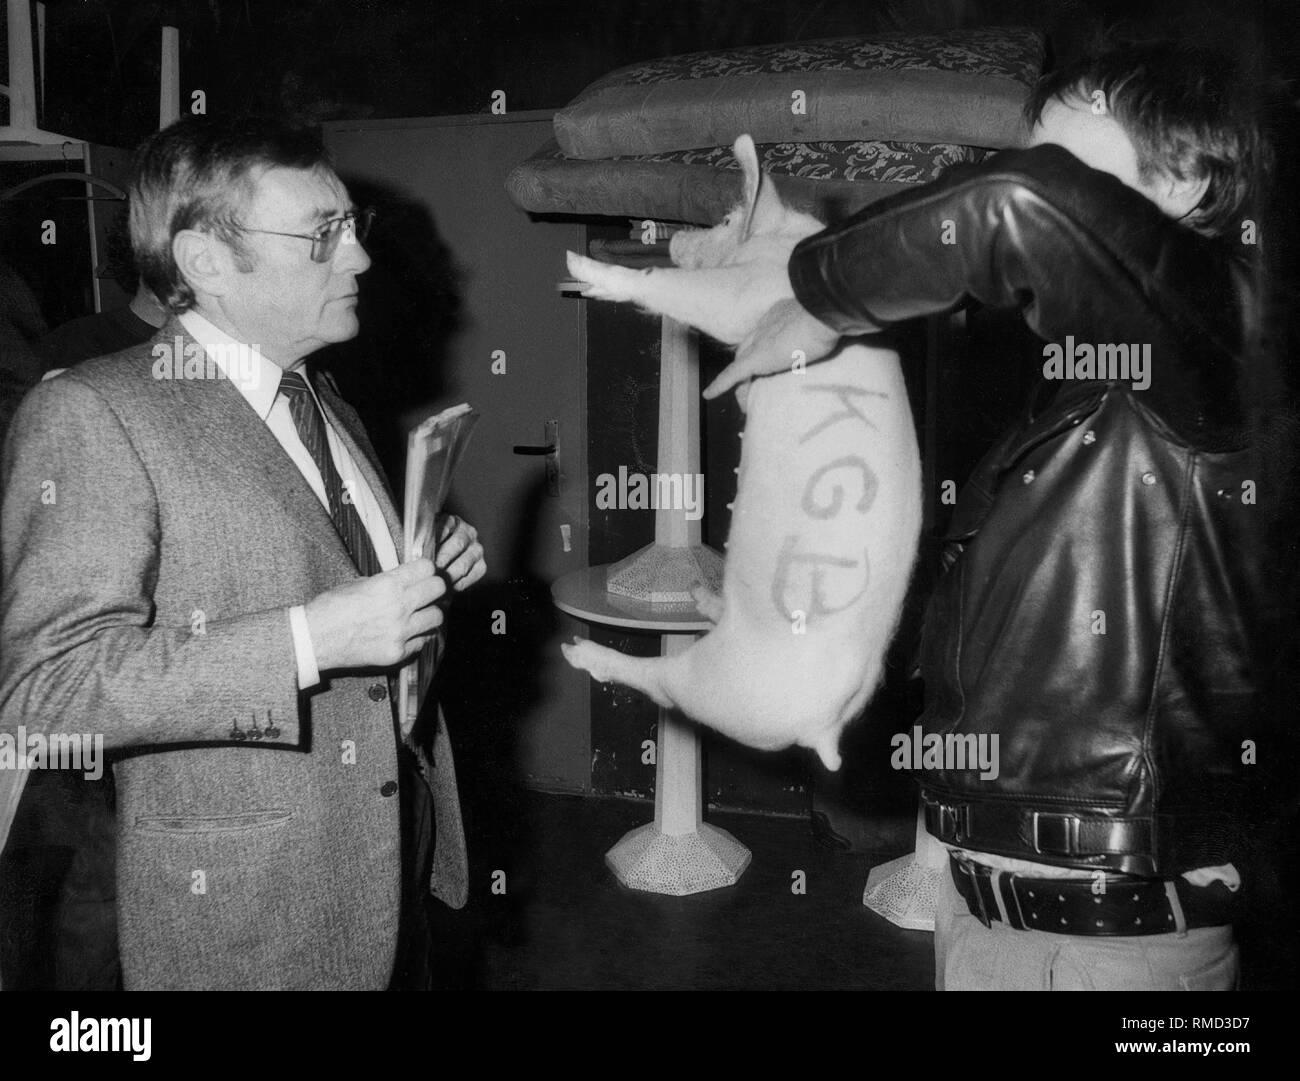 The publisher of 'Der Spiegel' Rudolf Augstein was defamed at this year's Bertelsmann event series 'Reden ueber das eigene Land: Deutschland' (Speeches about one's own country: Germany) in the Munich Kammerspiele: A stranger had given a piglet to the journalist, which bore the inscription 'Rudi - KGB'. - Stock Image